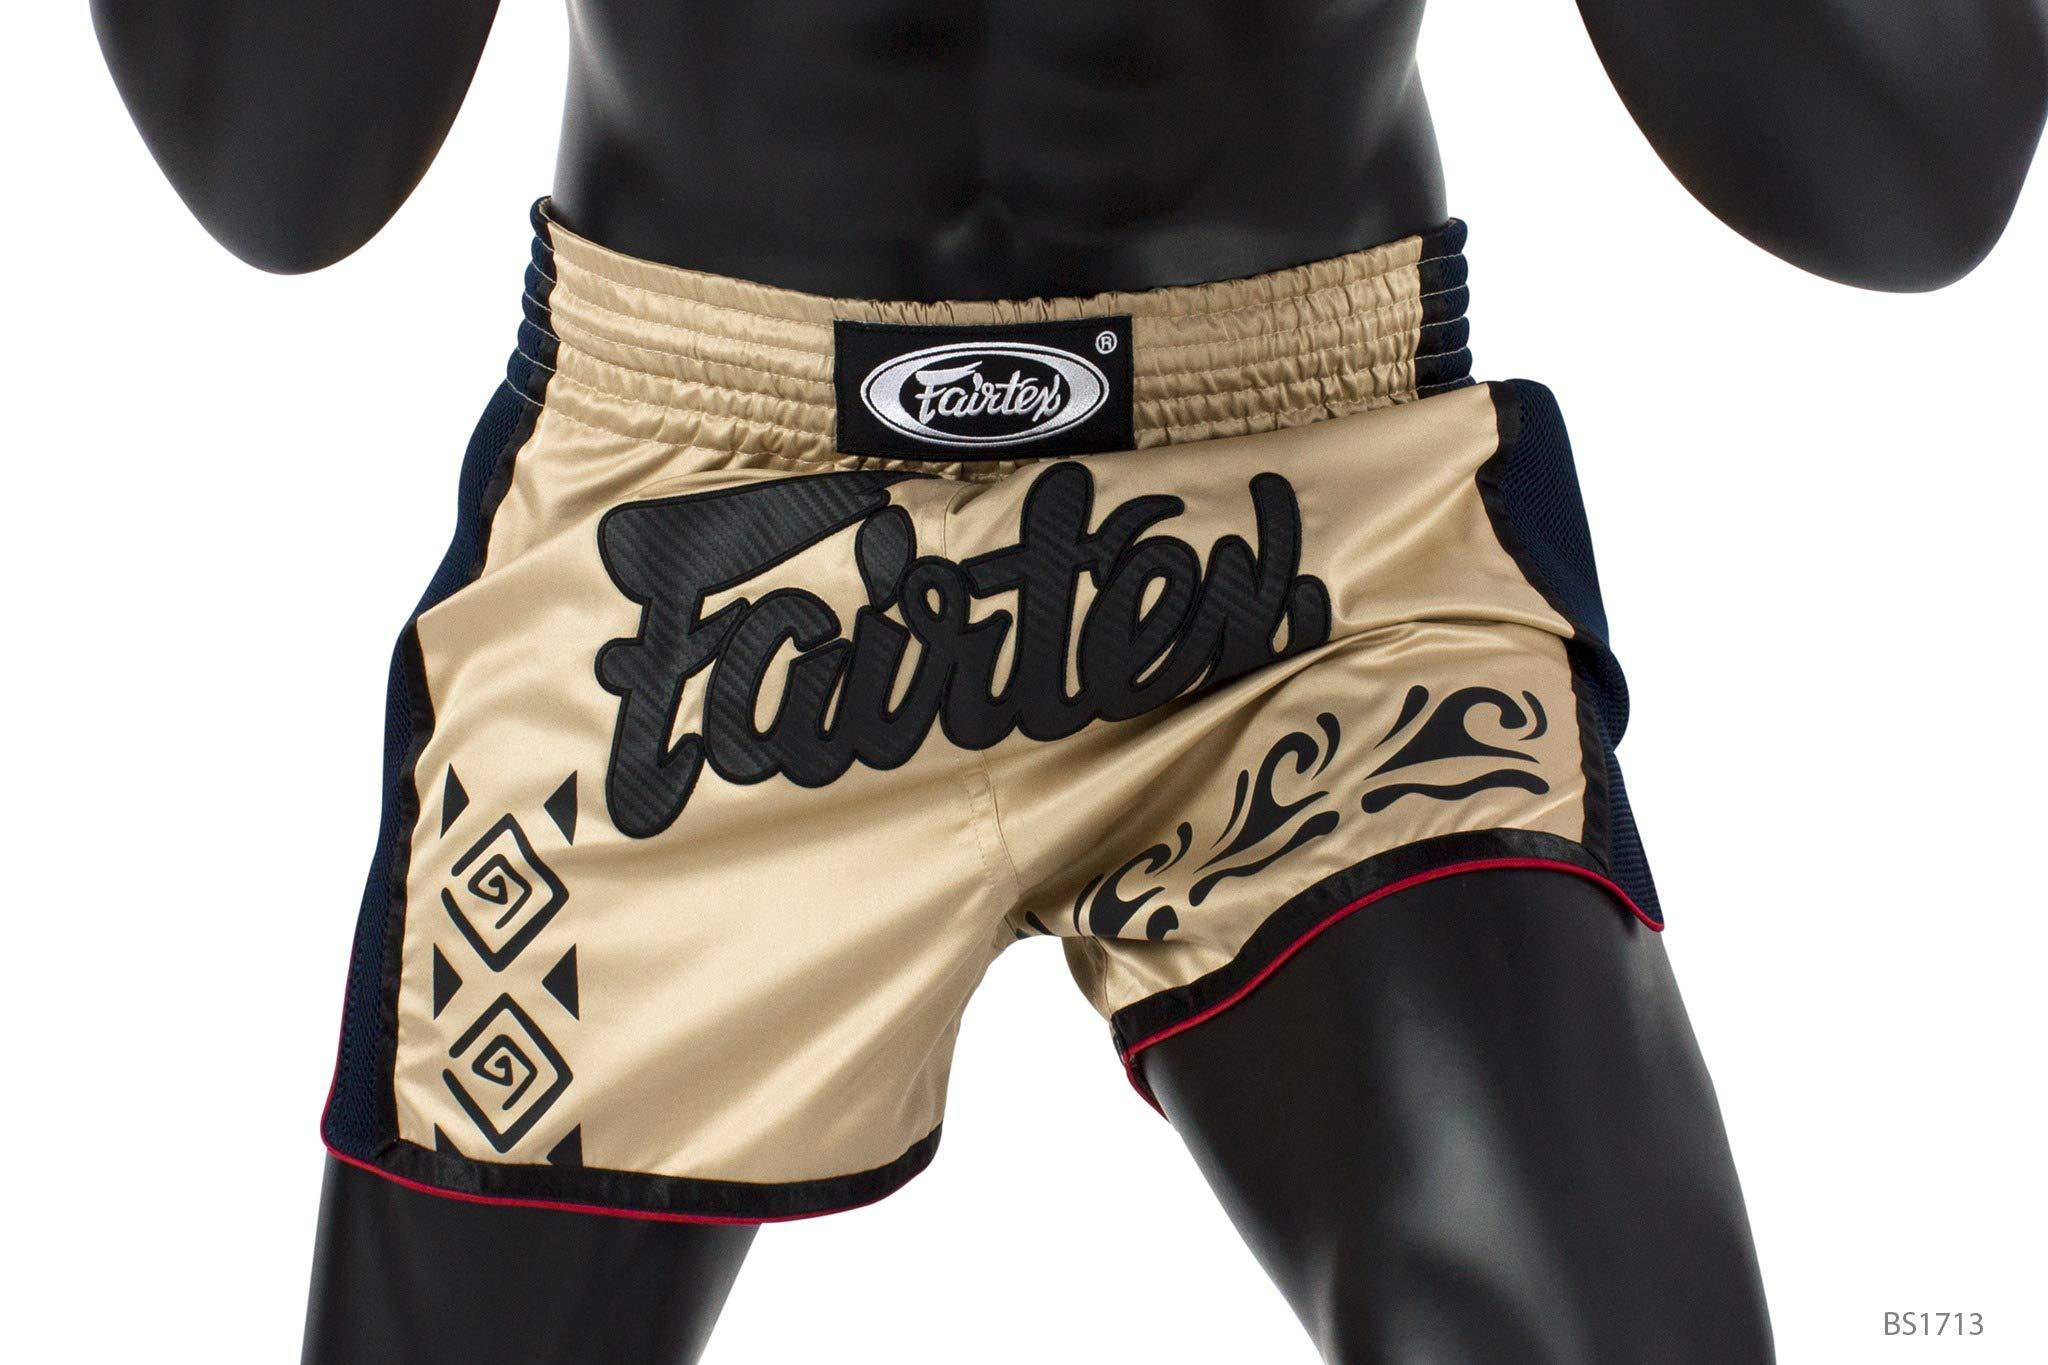 Fairtex New Muay Thai Boxing Shorts Slim Cut